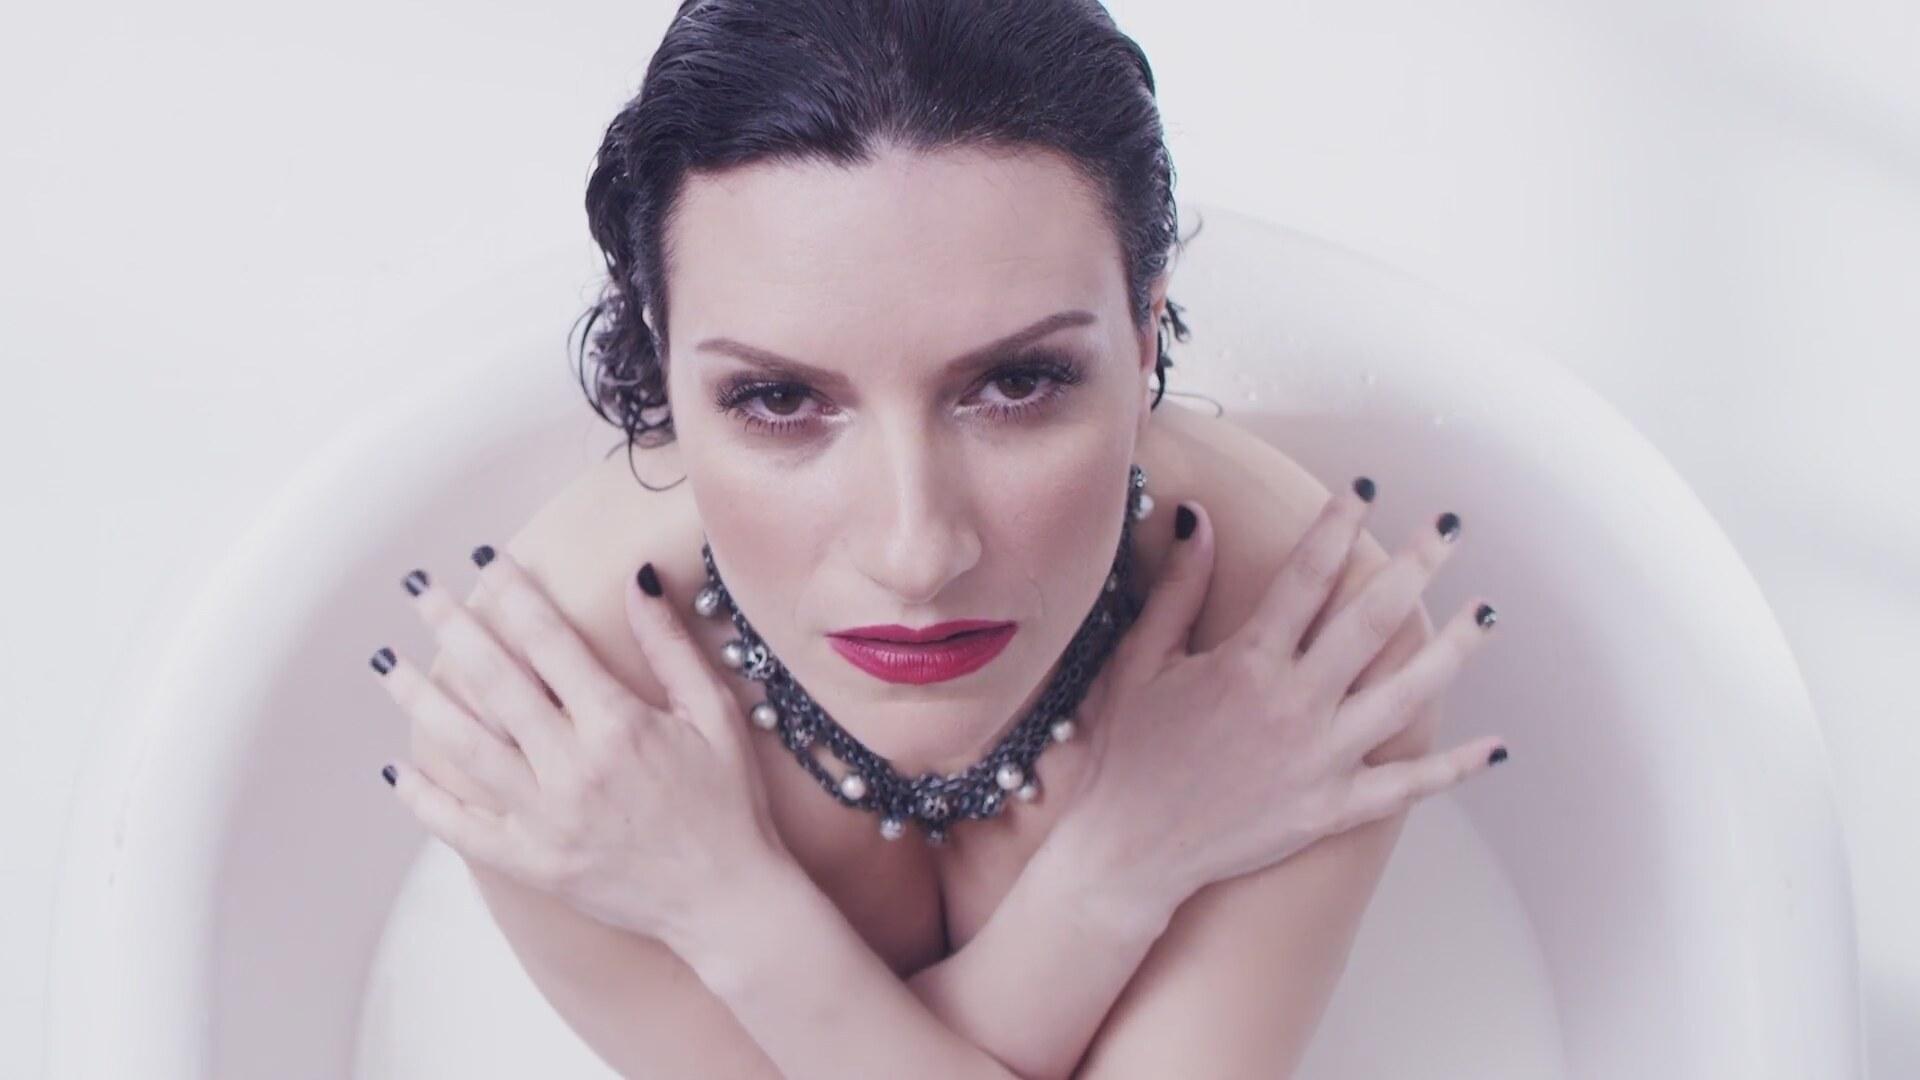 Laura Pausini Se Desnuda En Su último Videoclip